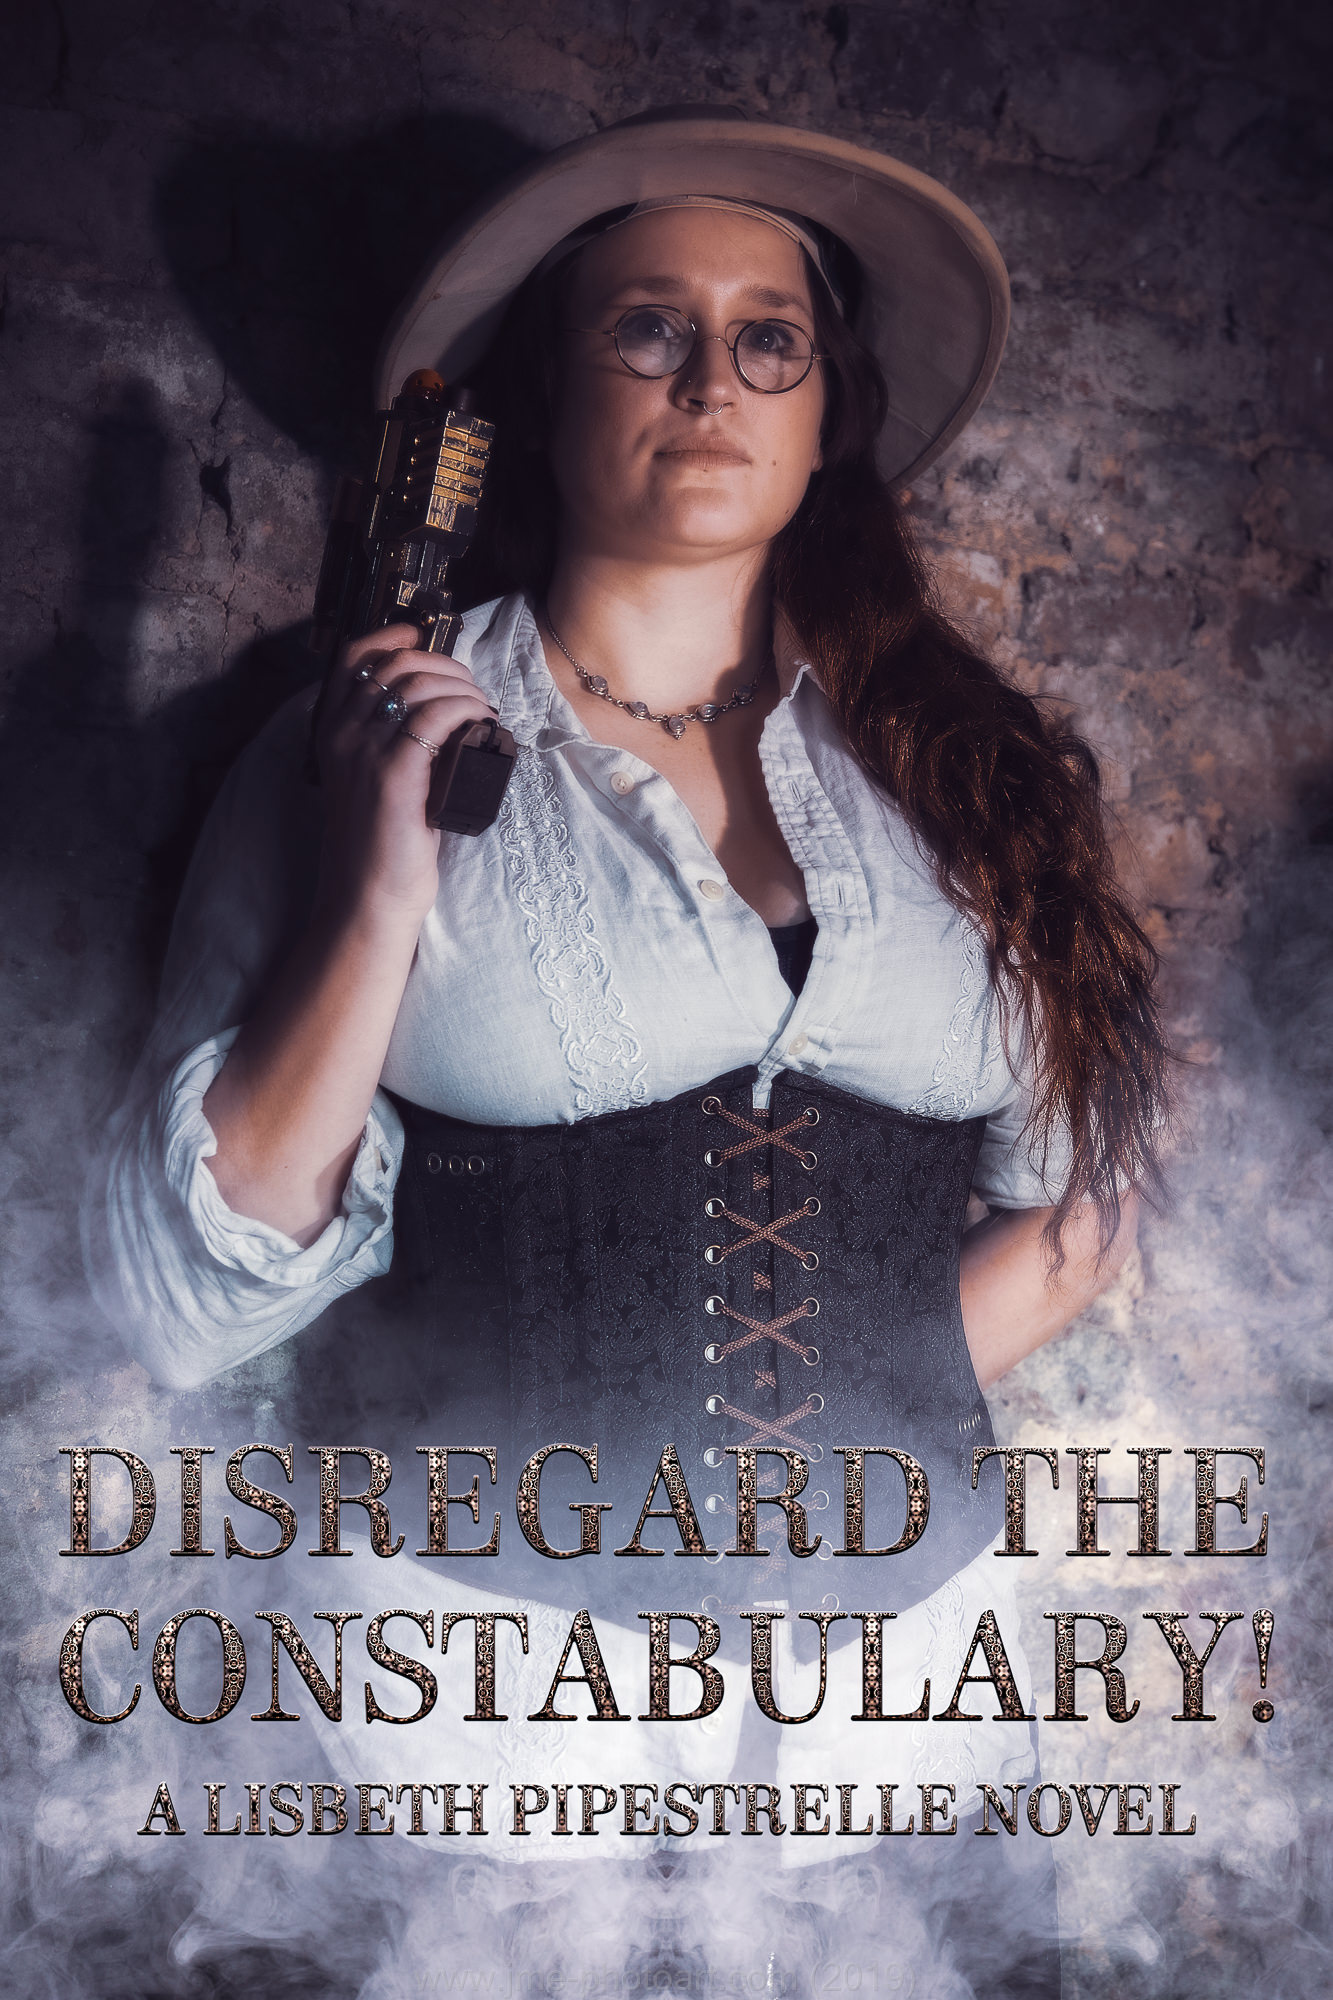 'Disregard the constabulary!' - Model: Lisbeth Pipestrelle  December 2018